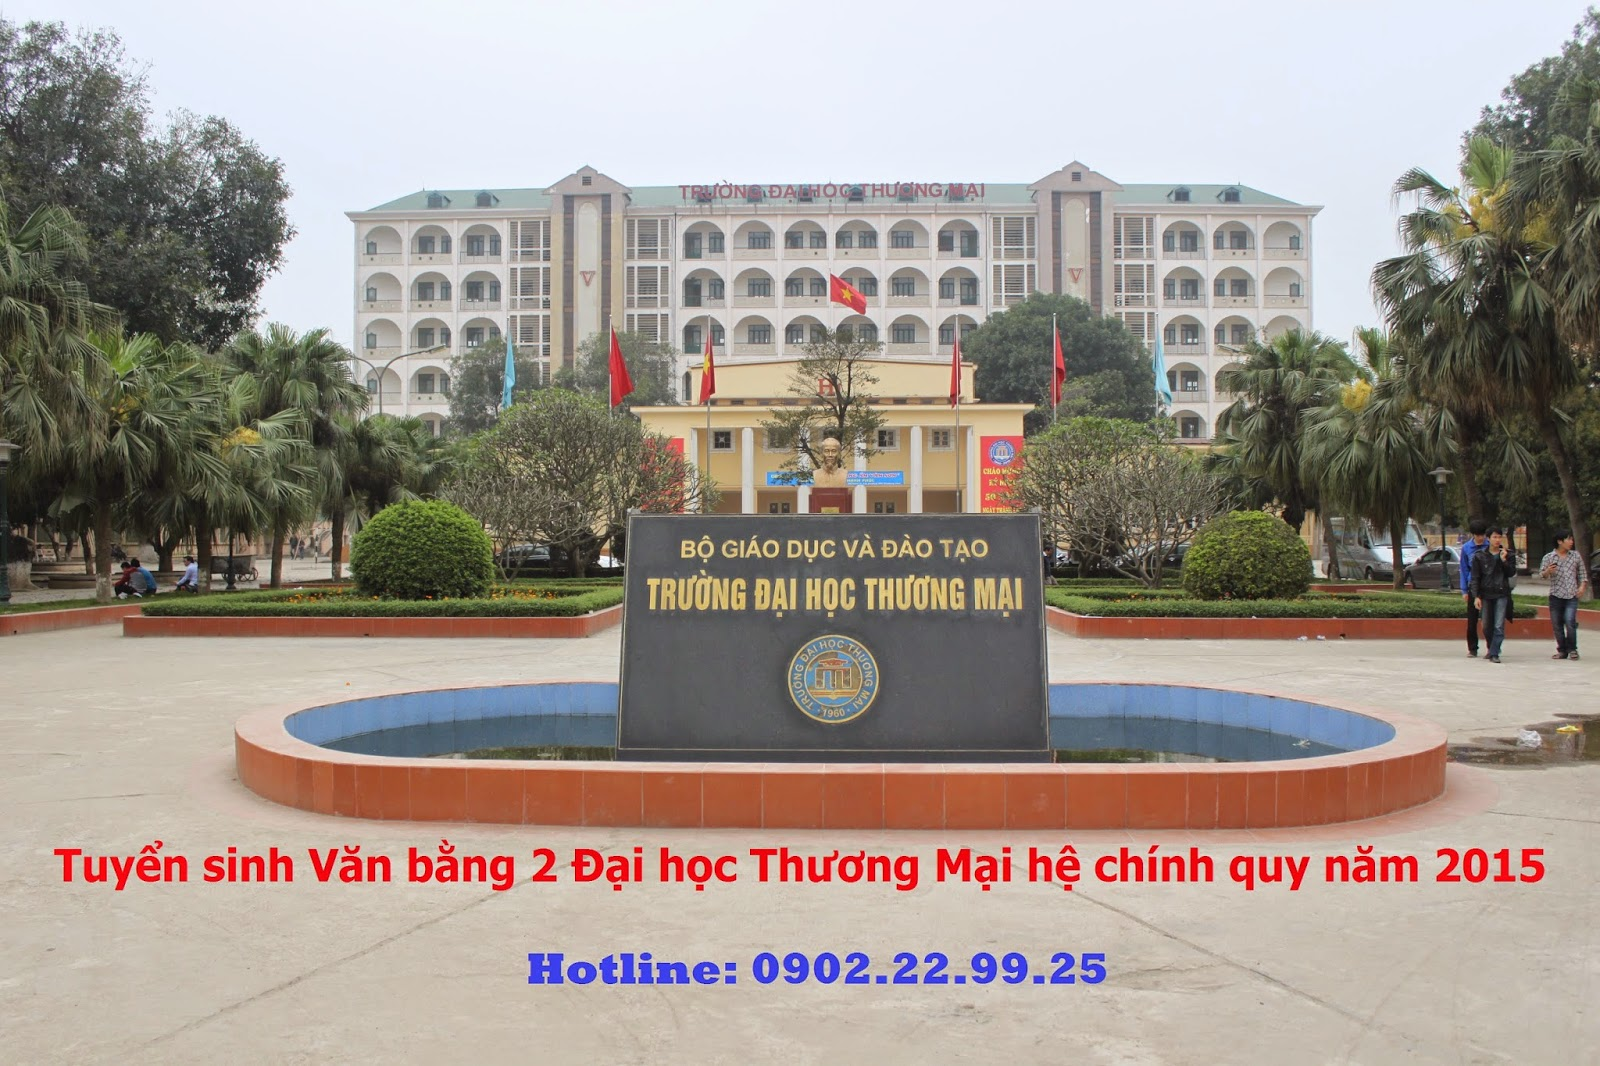 van-bang-2-dai-hoc-thuong-mai